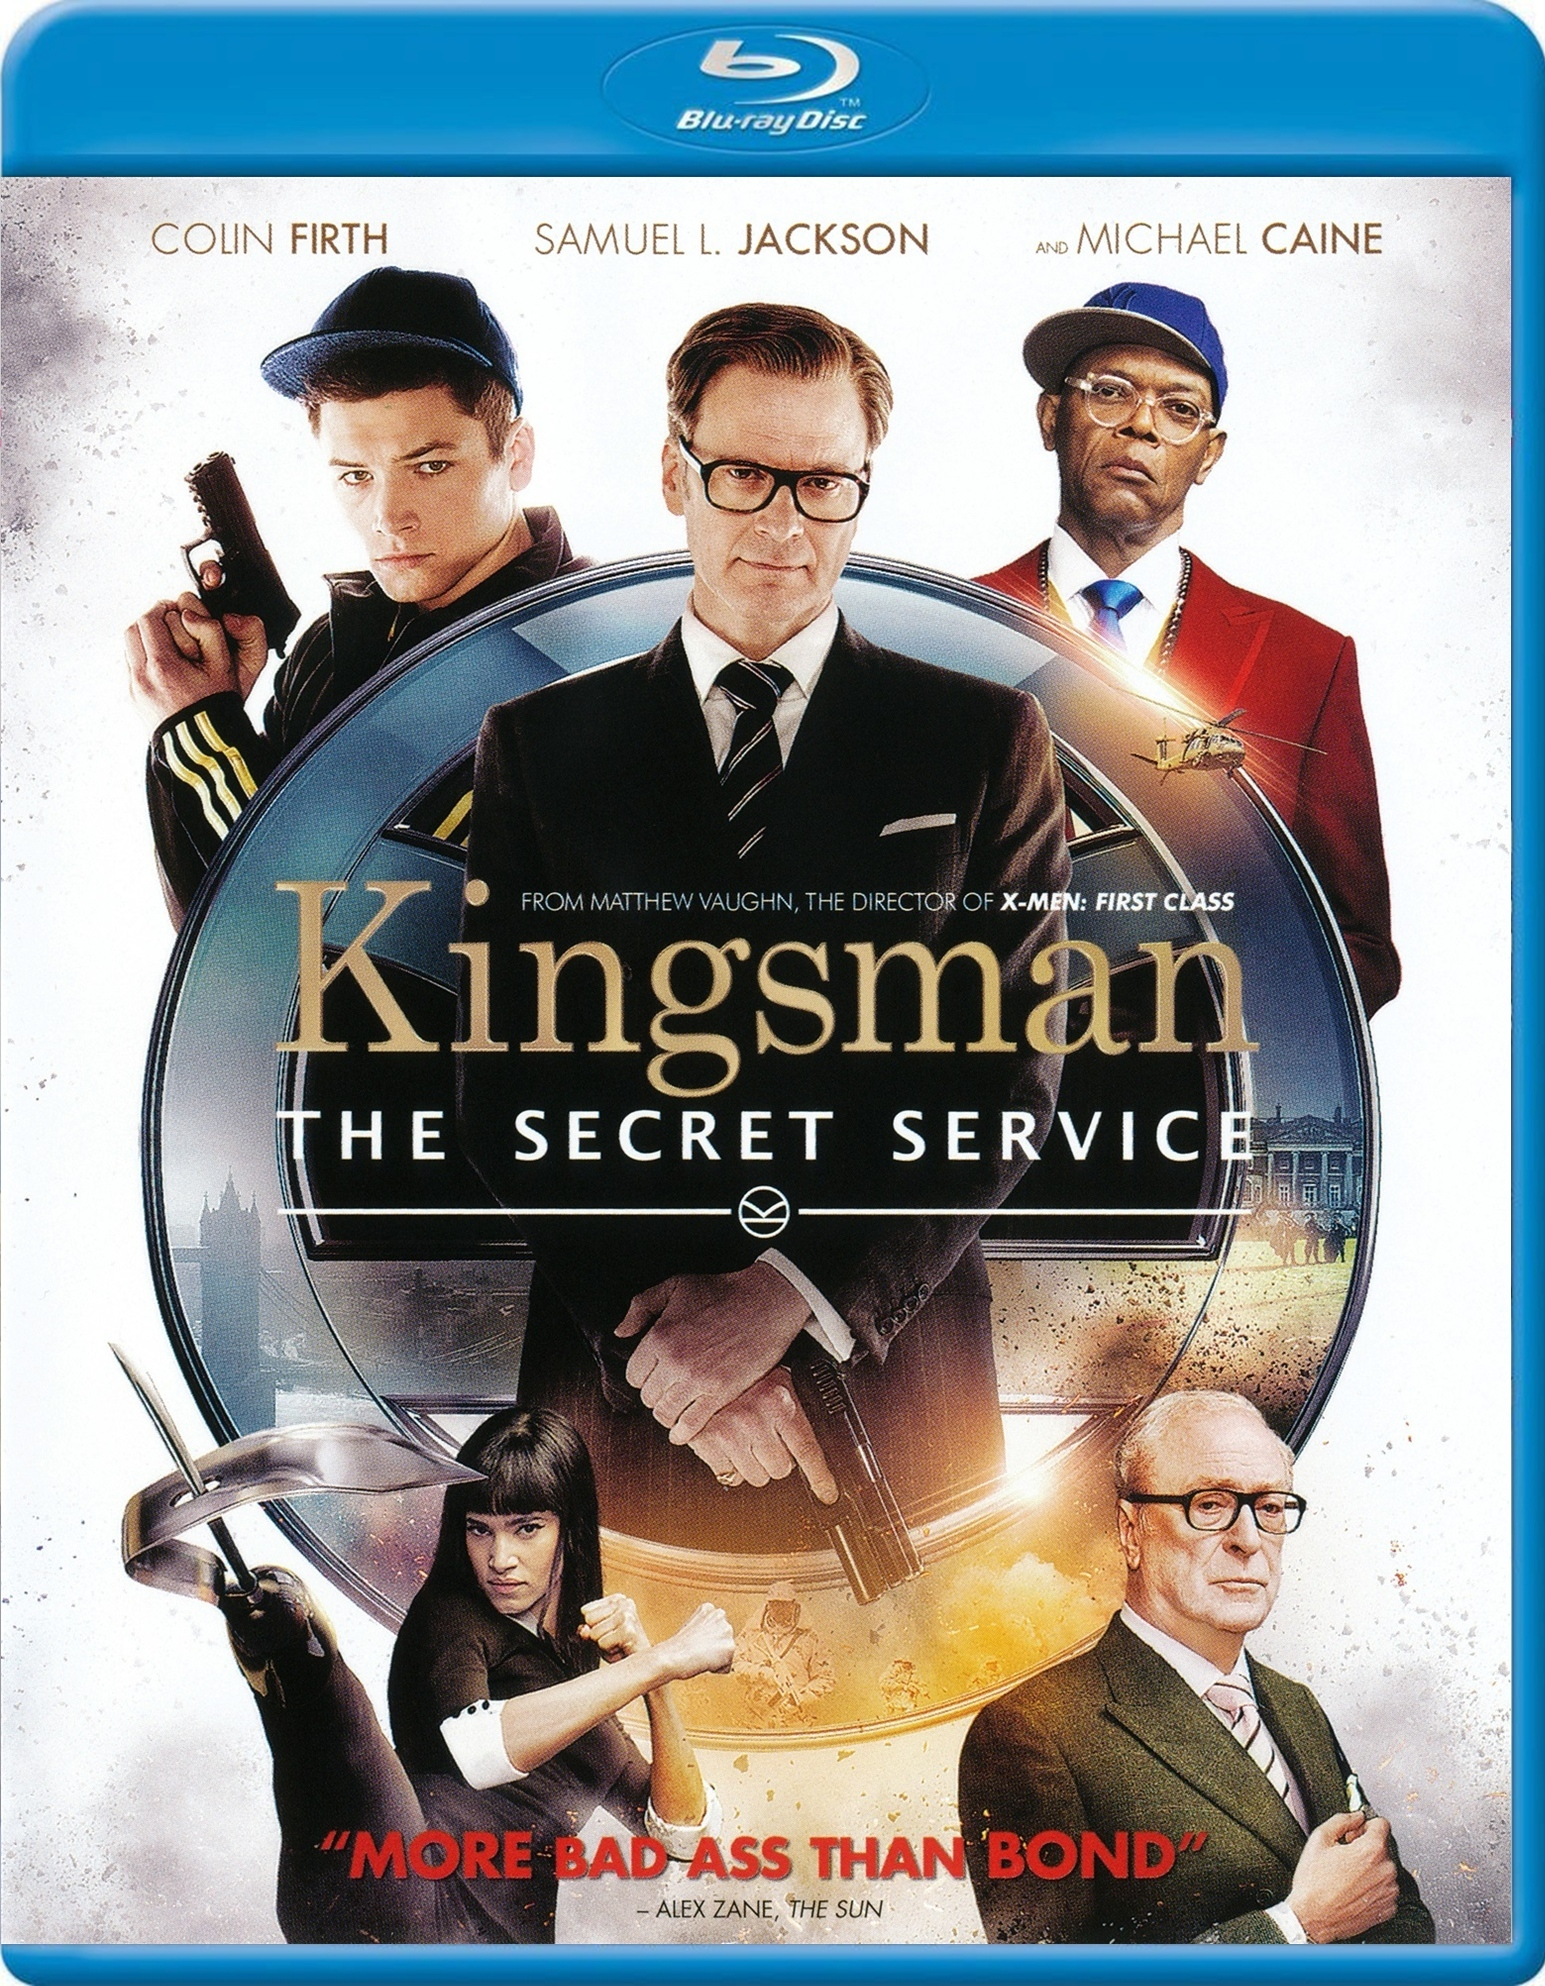 Kingsman: The Secret Service Revealed (2015) (V) Watch Full Movie Free Online